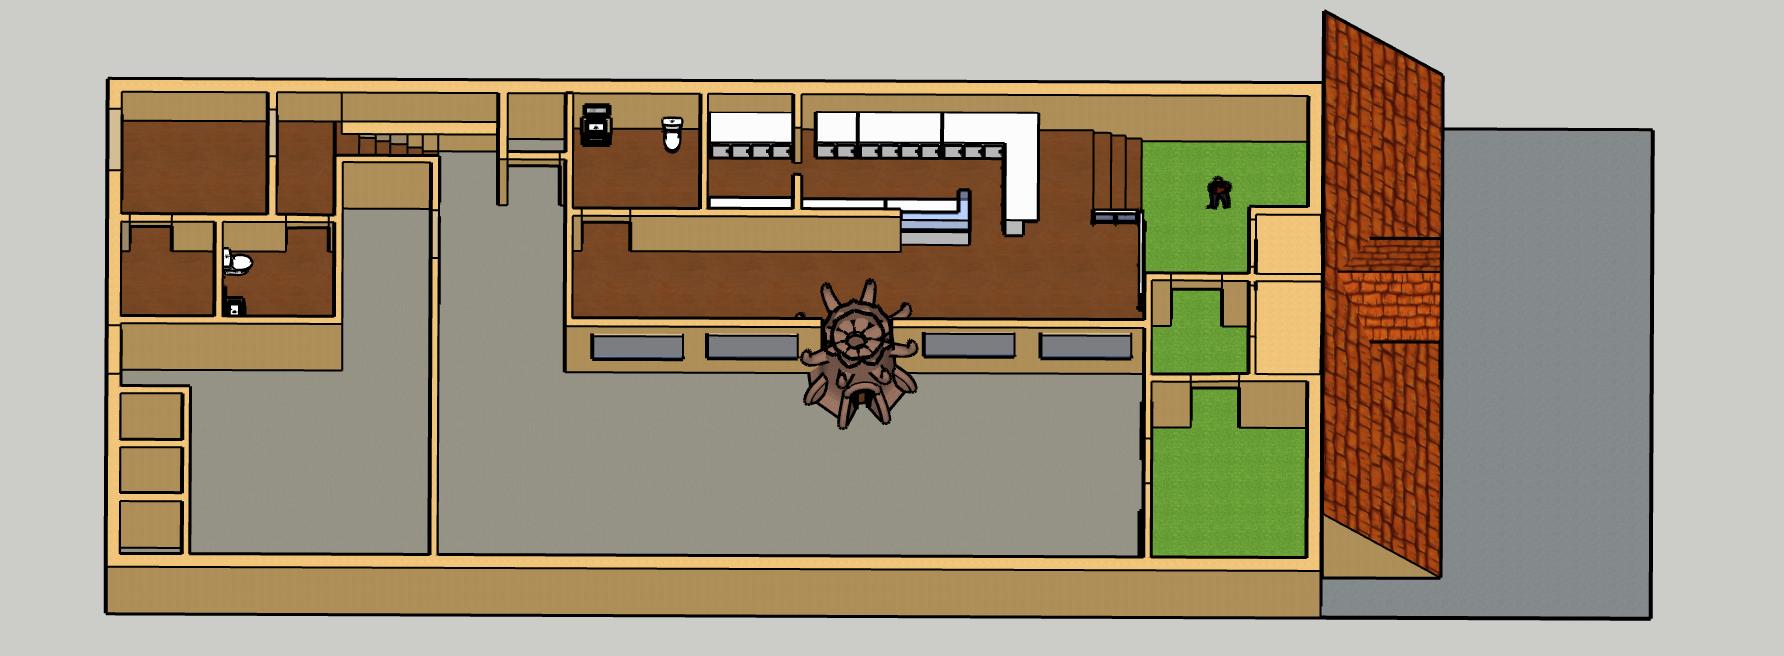 Catoro Cafe